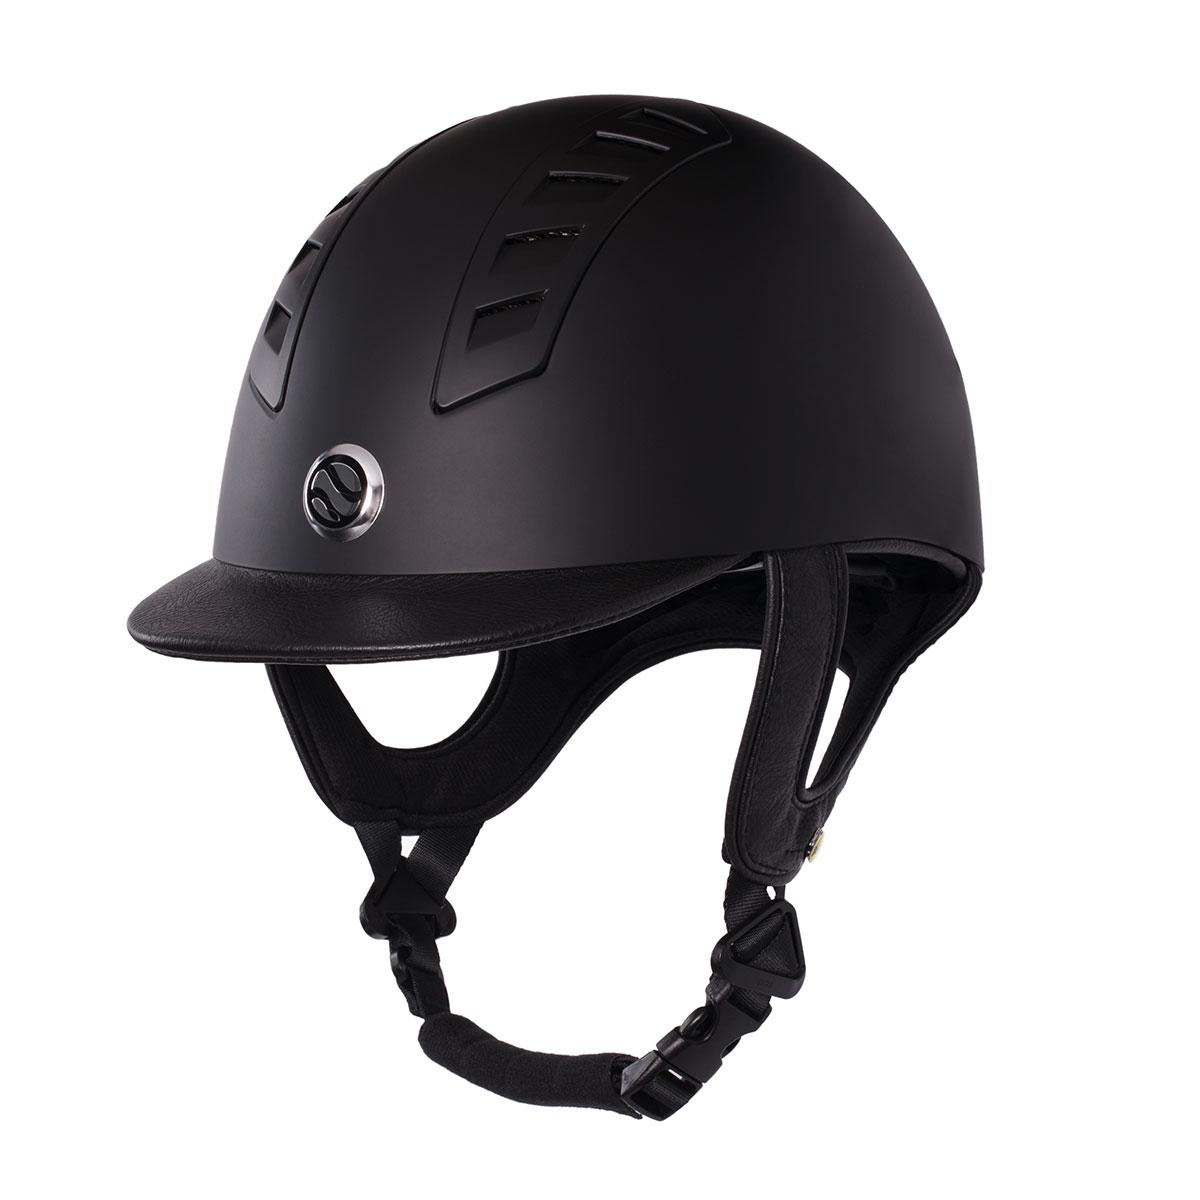 Cowboy Hat Motorcycle Helmets ee2176a1afb